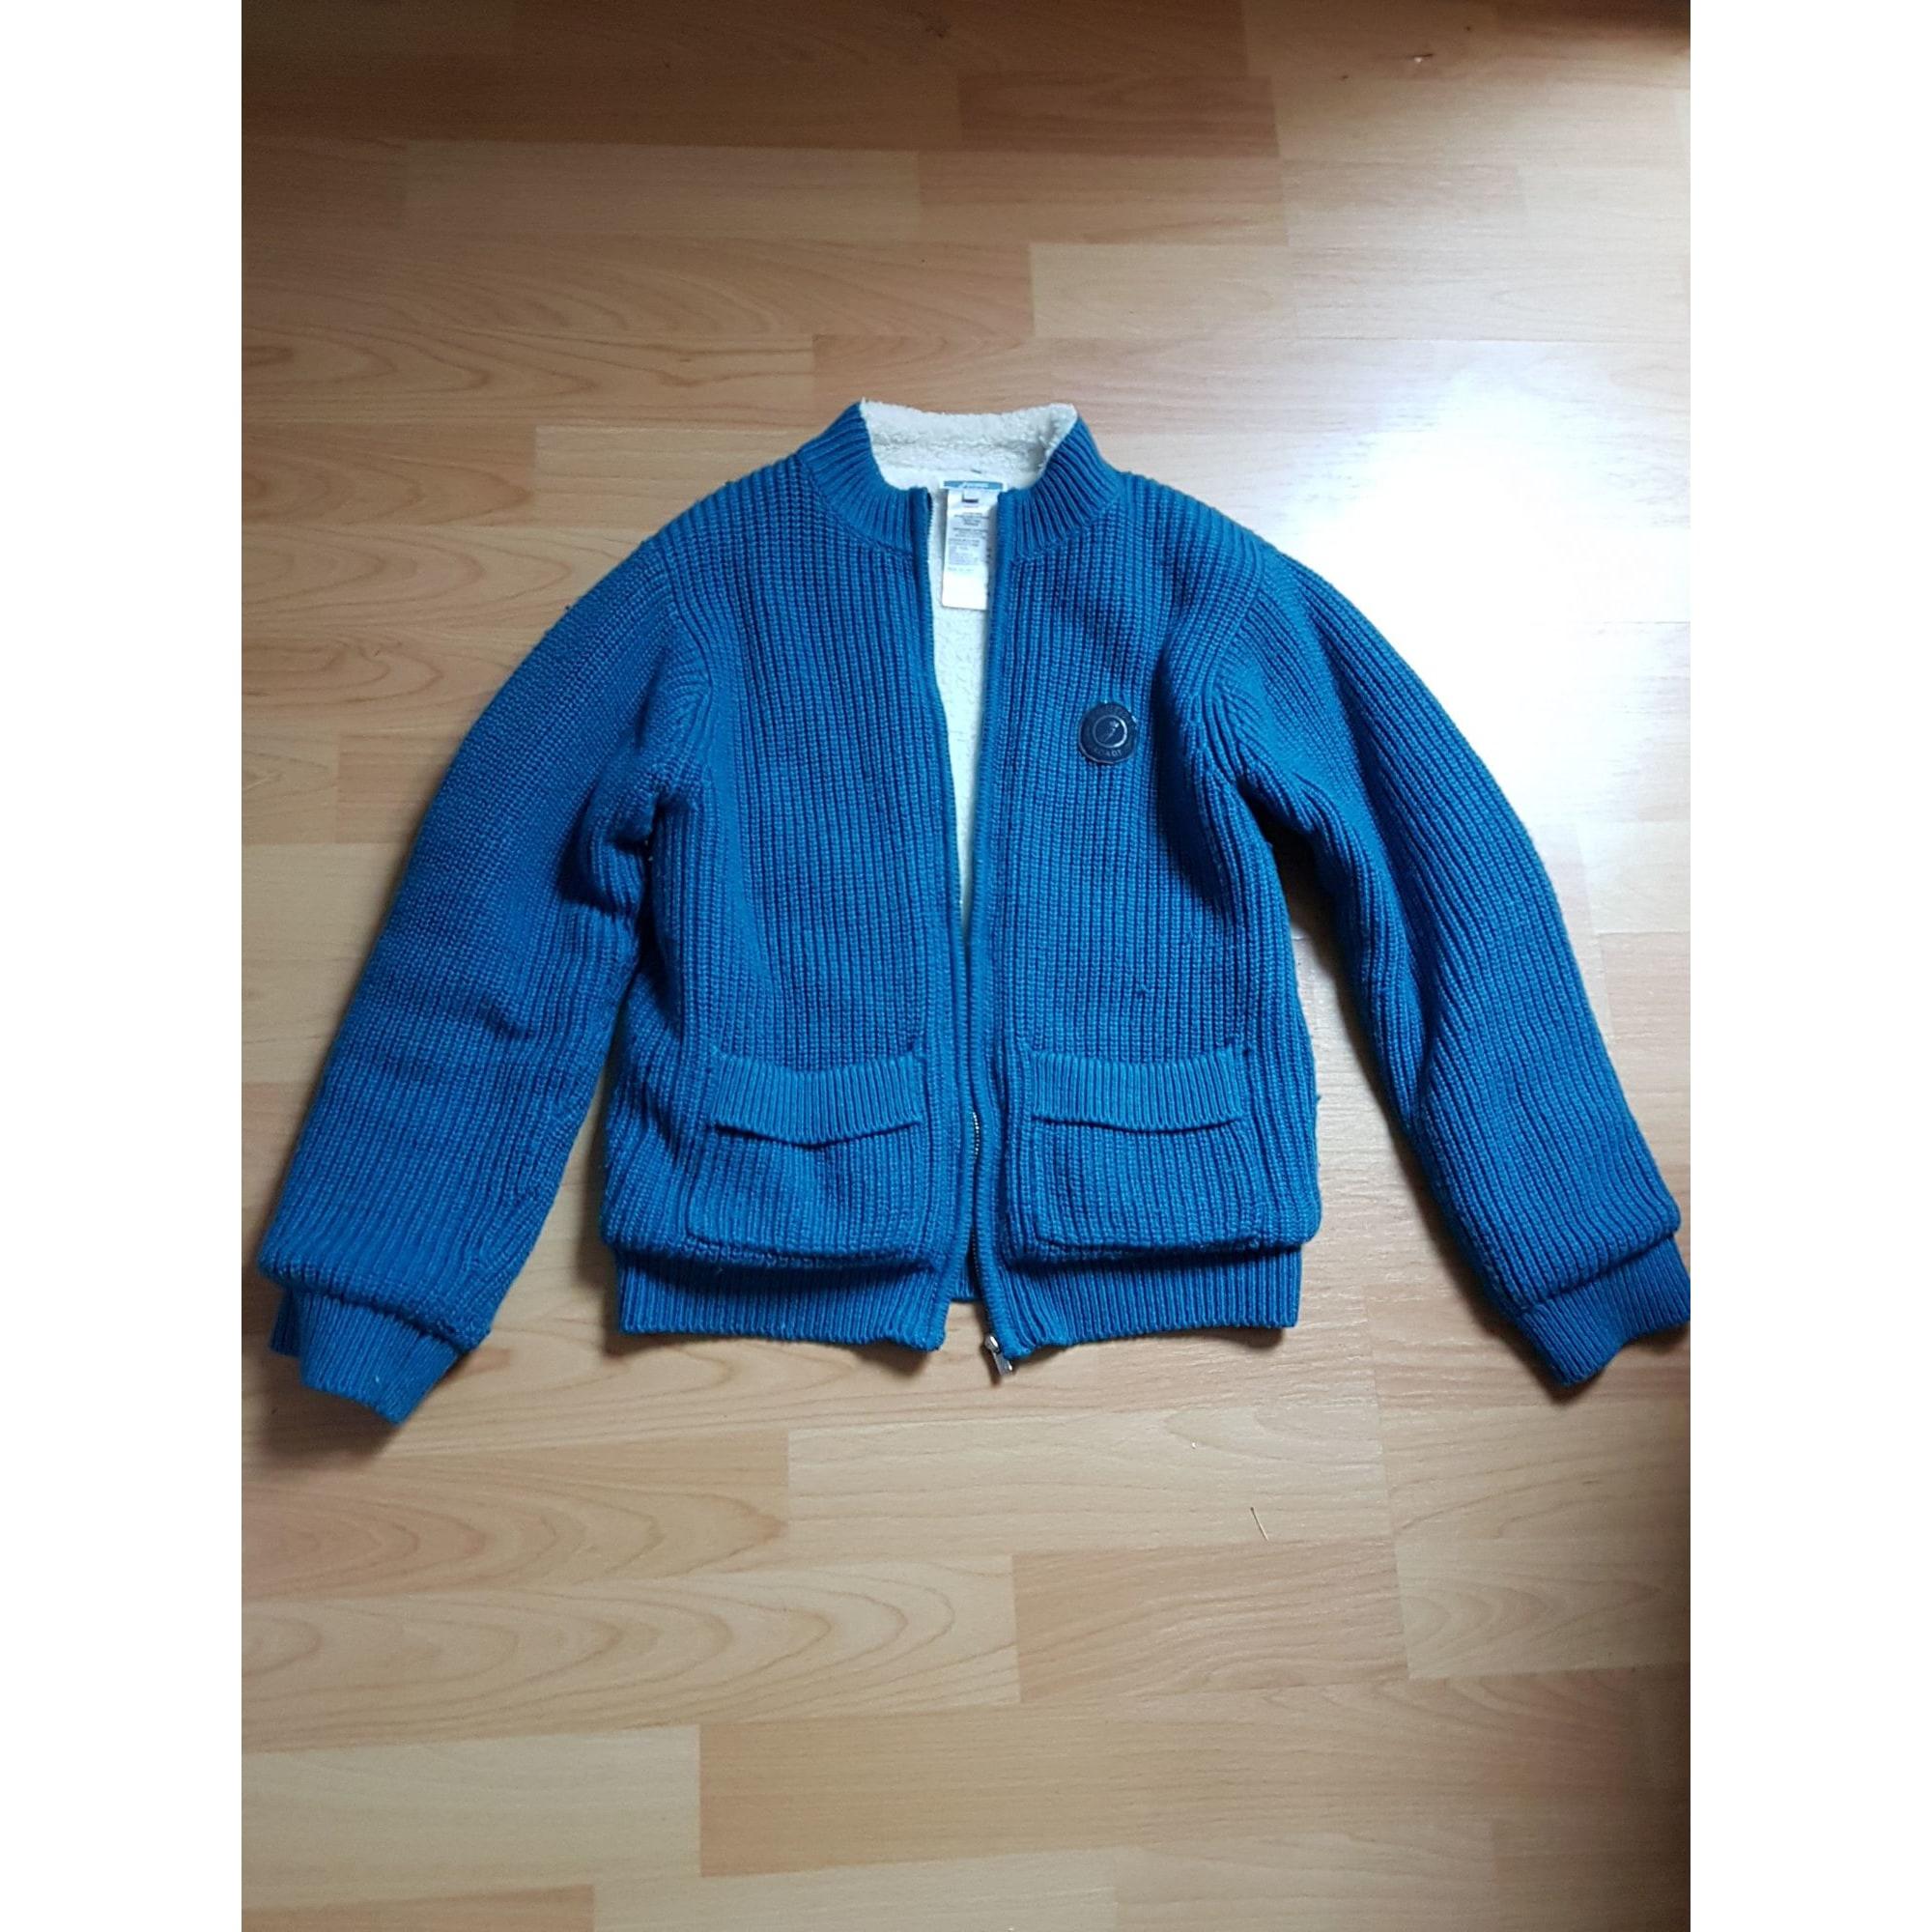 Vest, Cardigan JACADI Blue, navy, turquoise